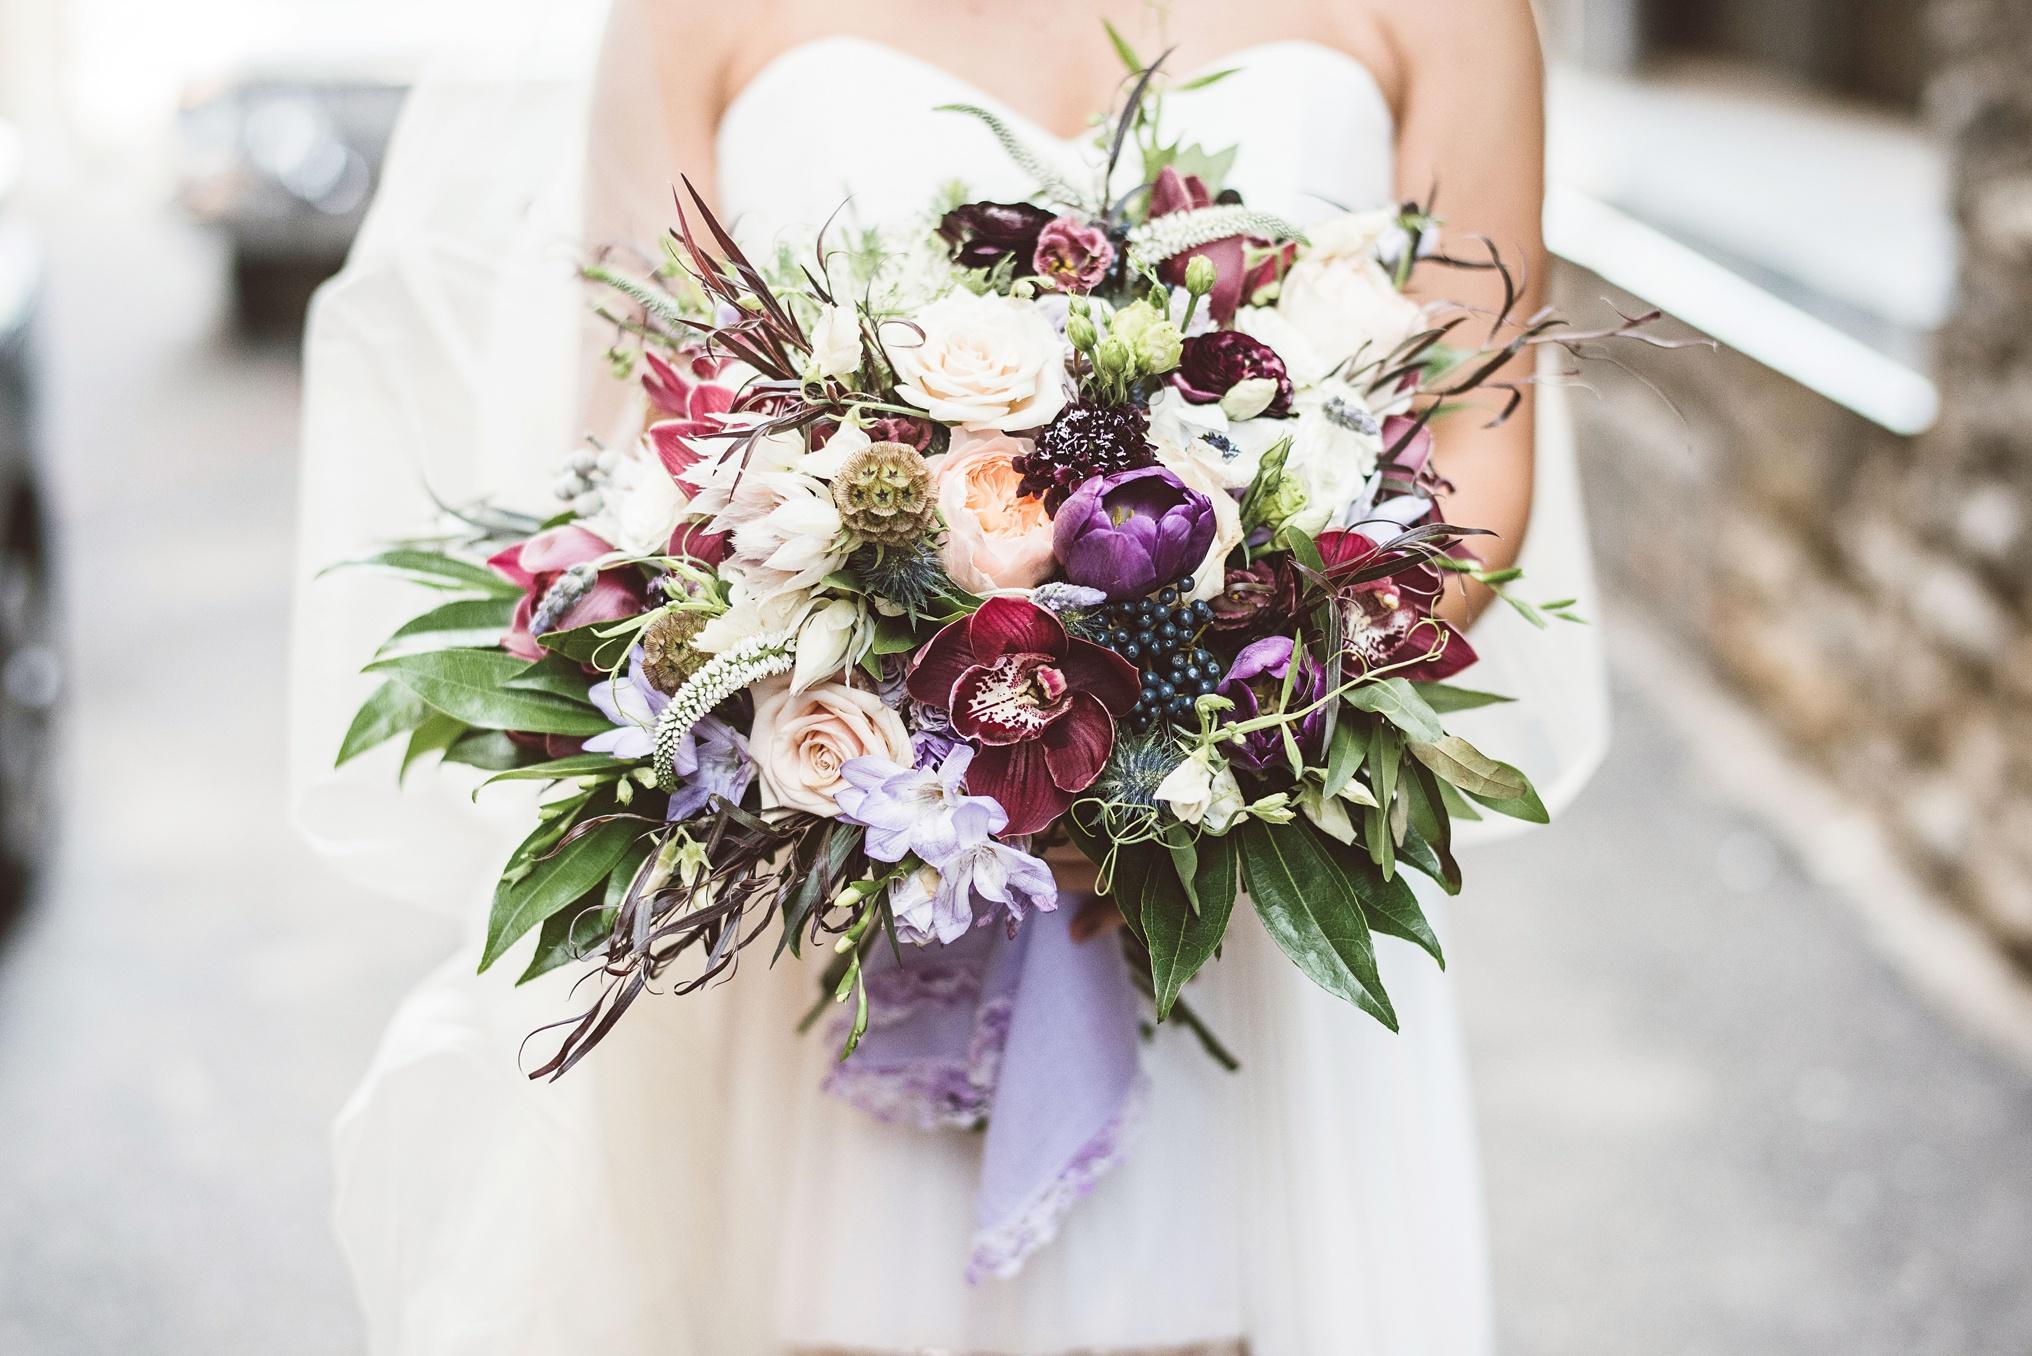 best_wedding_photography_2017_by_lucas_botz_photography_101.jpg